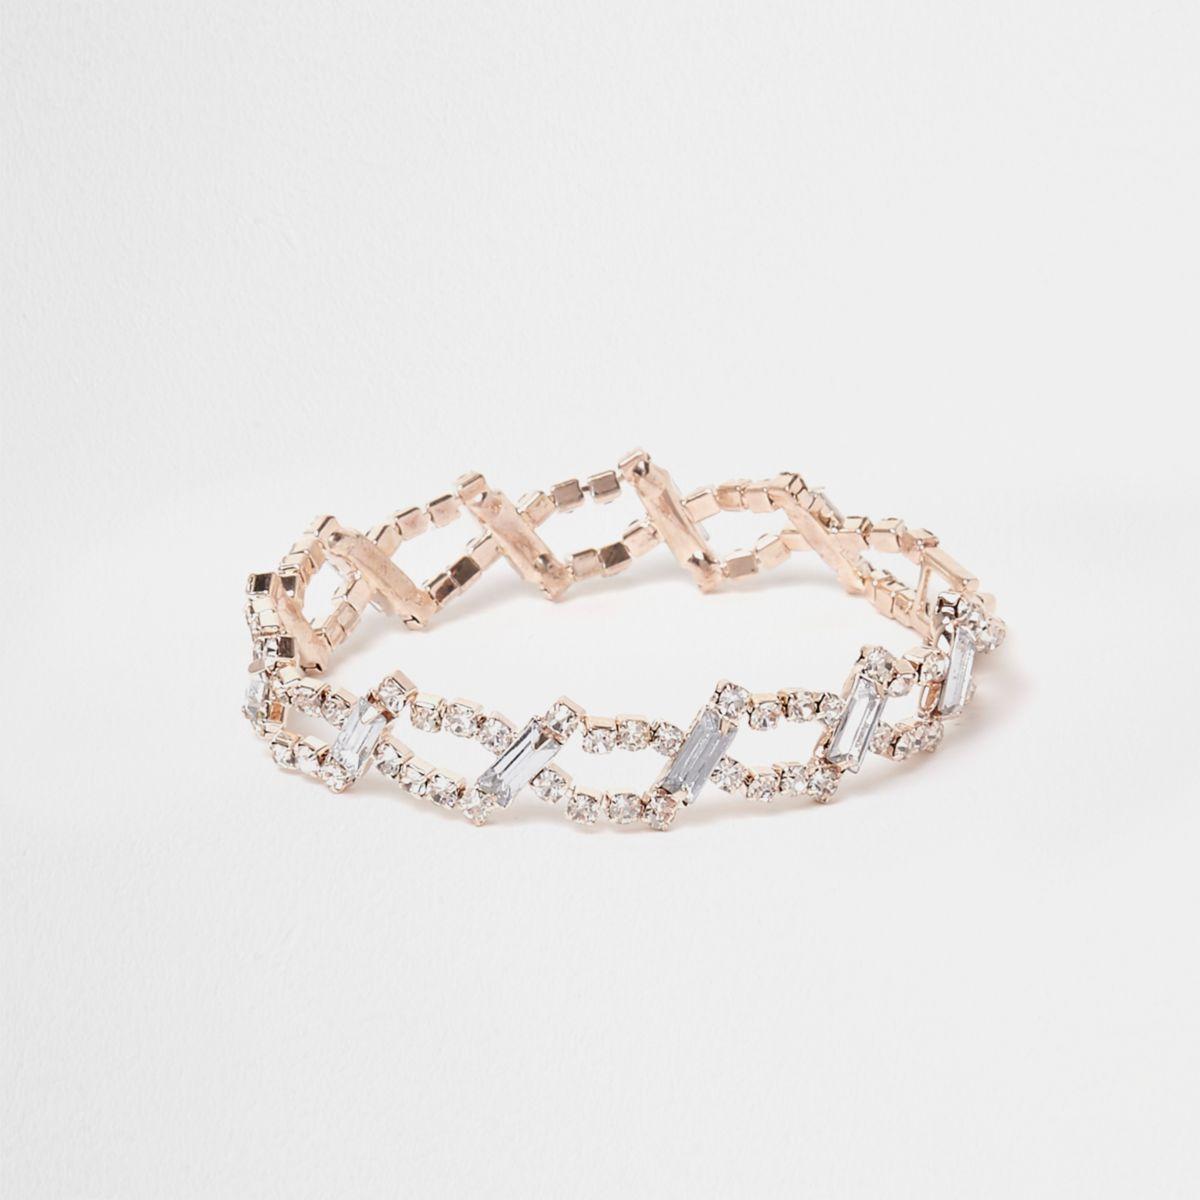 Rose gold tone diamante link bracelet